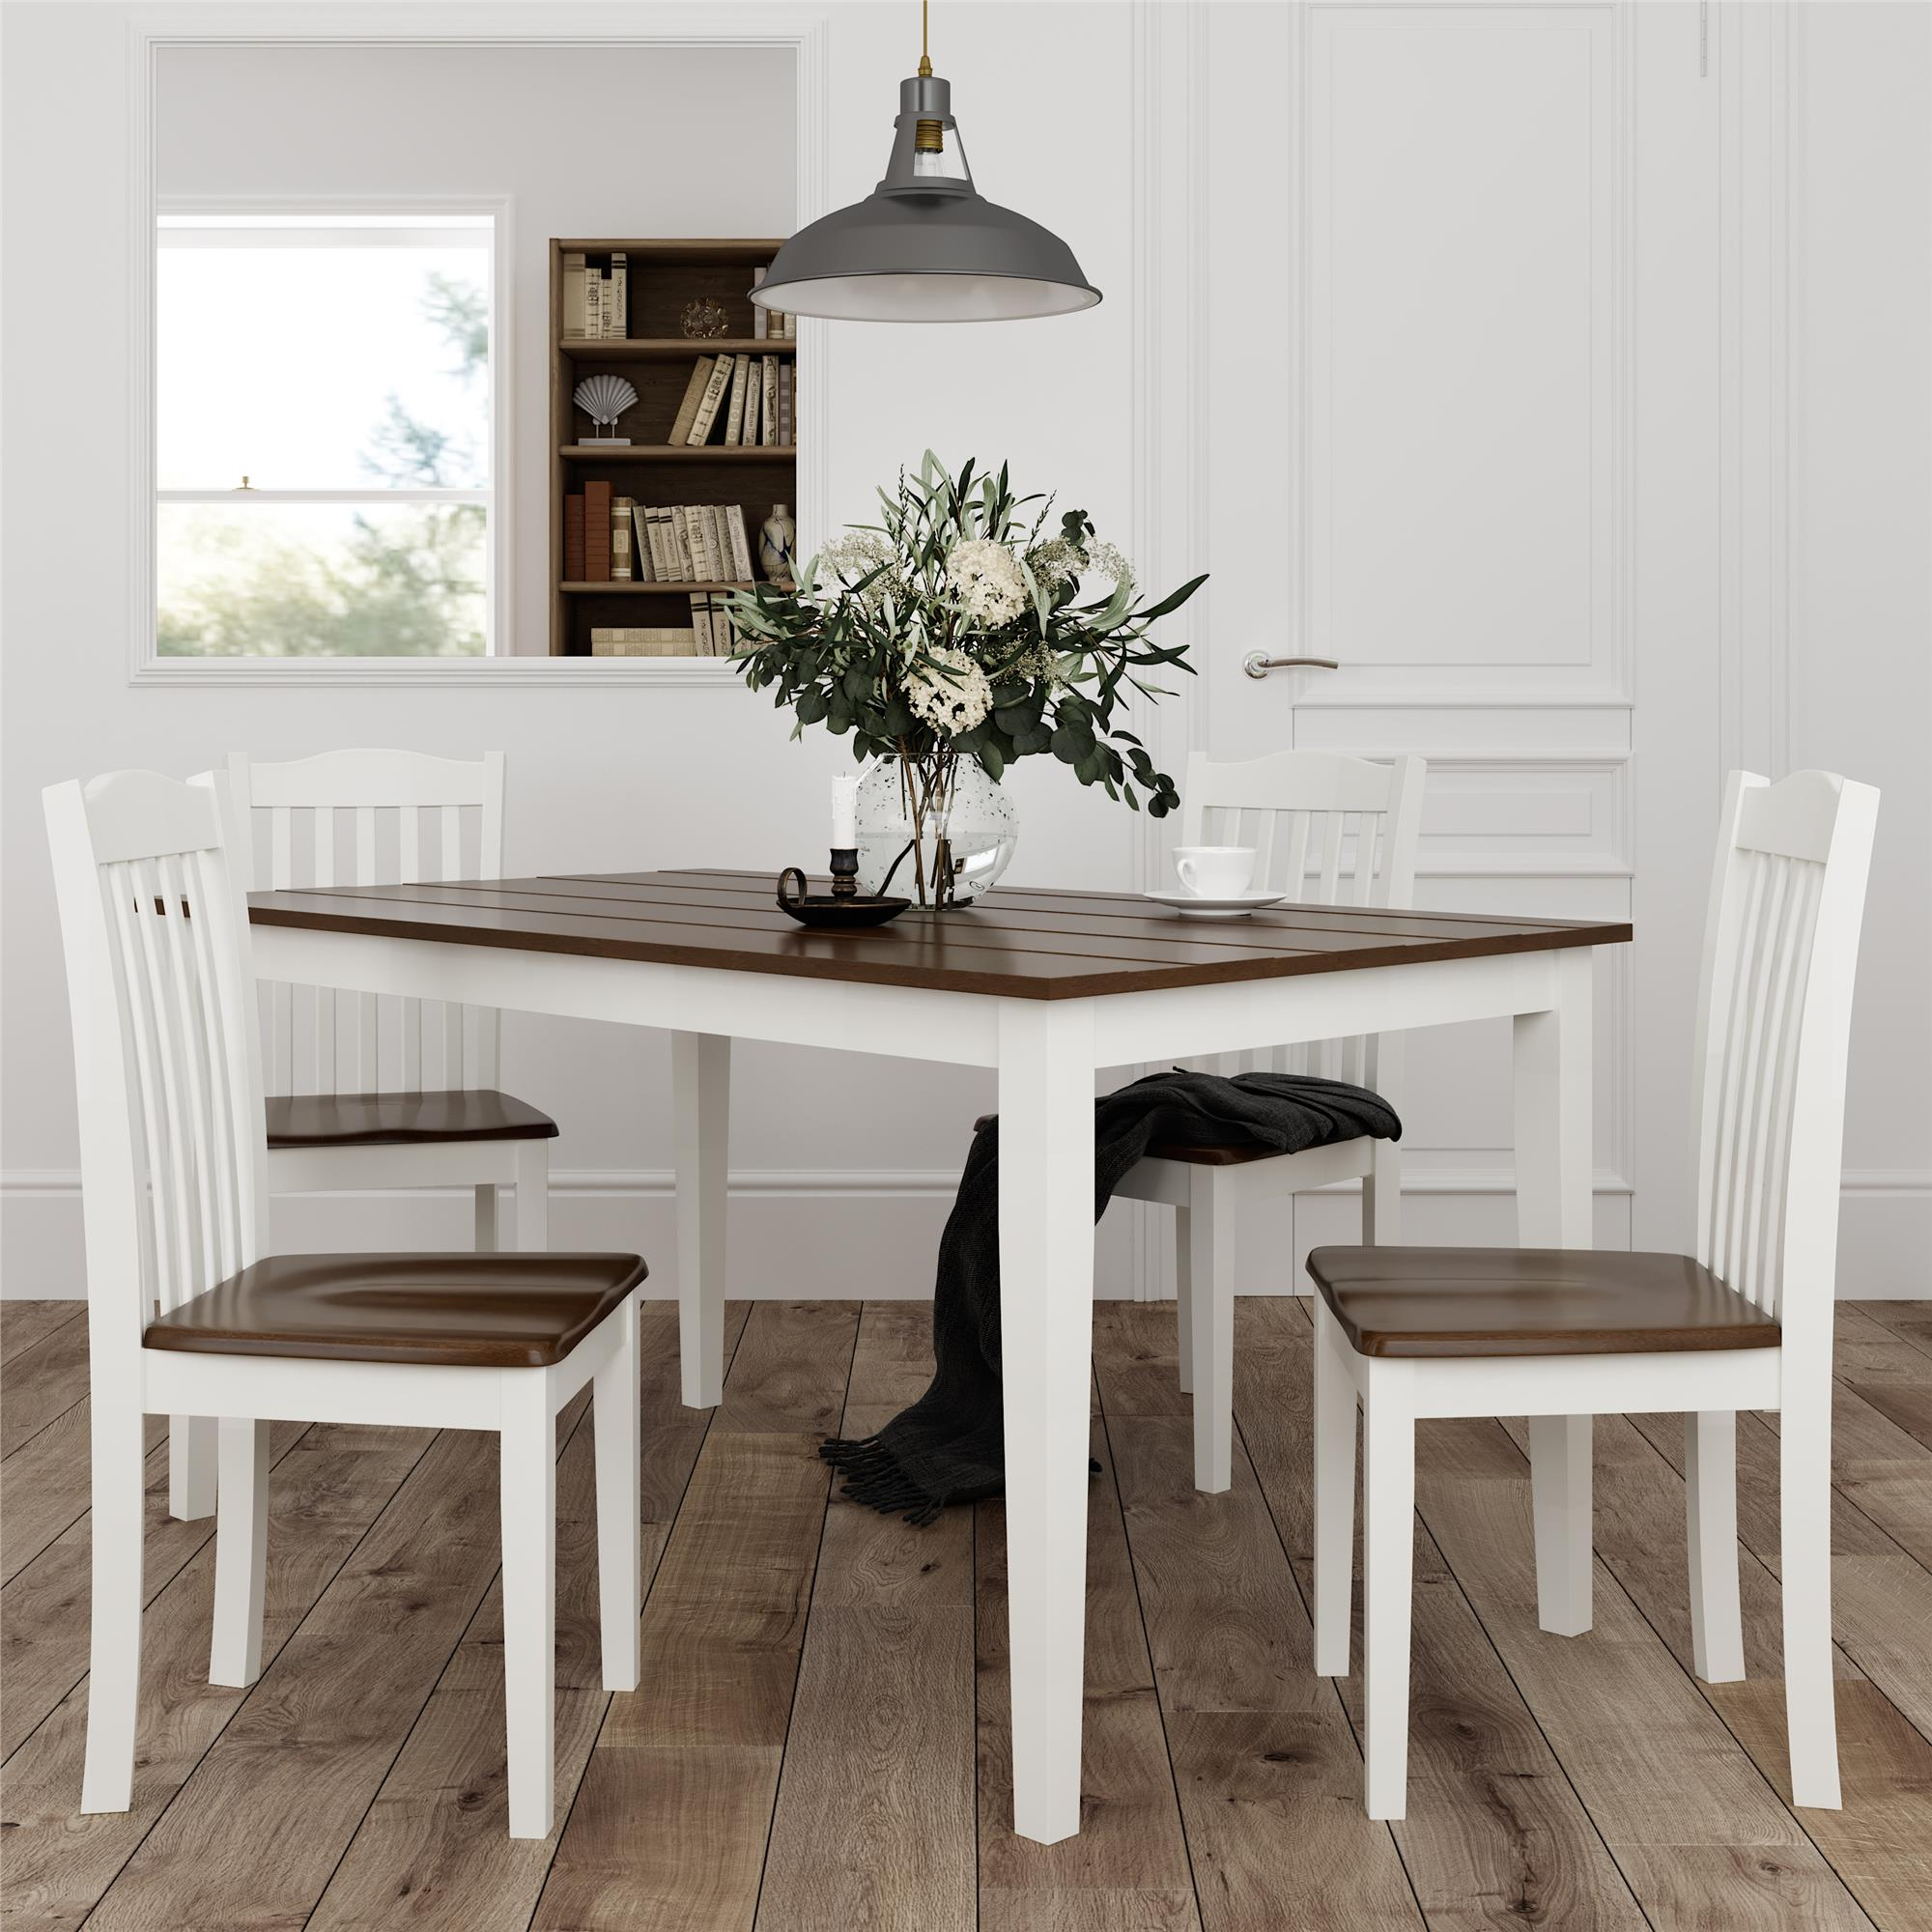 Dorel Living Shiloh 5 Piece Rustic, Rustic Dining Room Sets